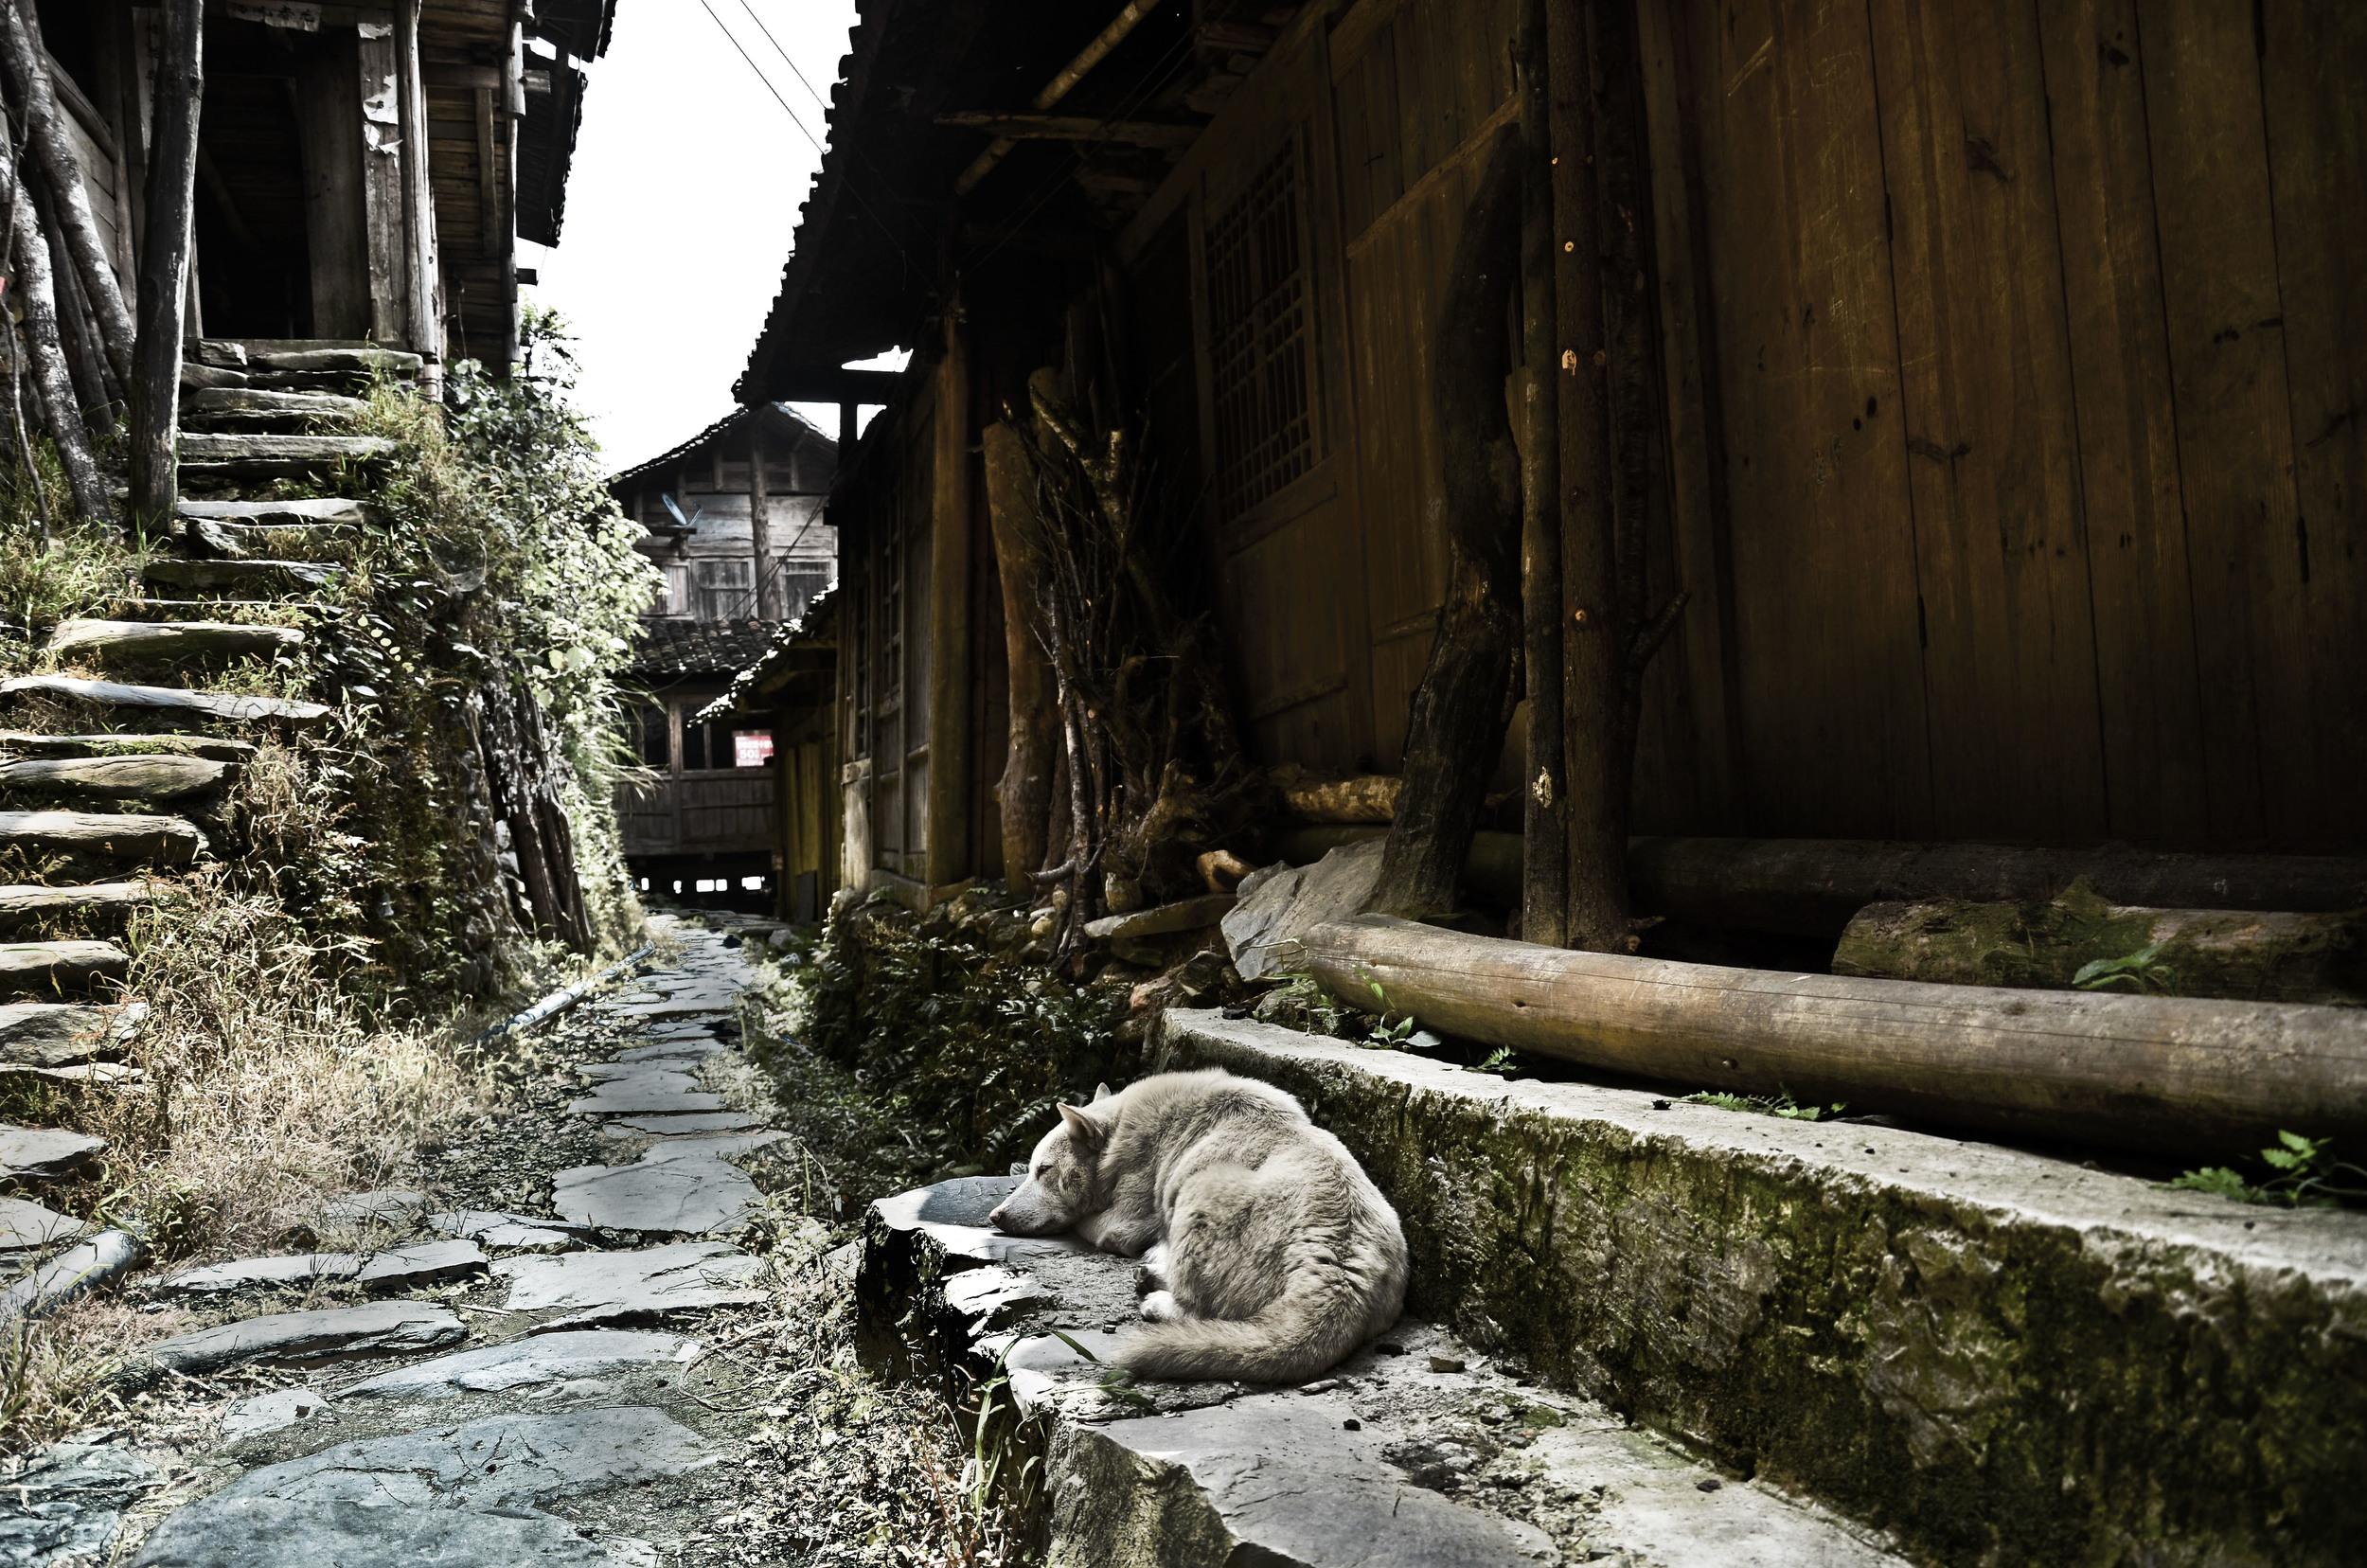 Dog Sleeping on step - alley